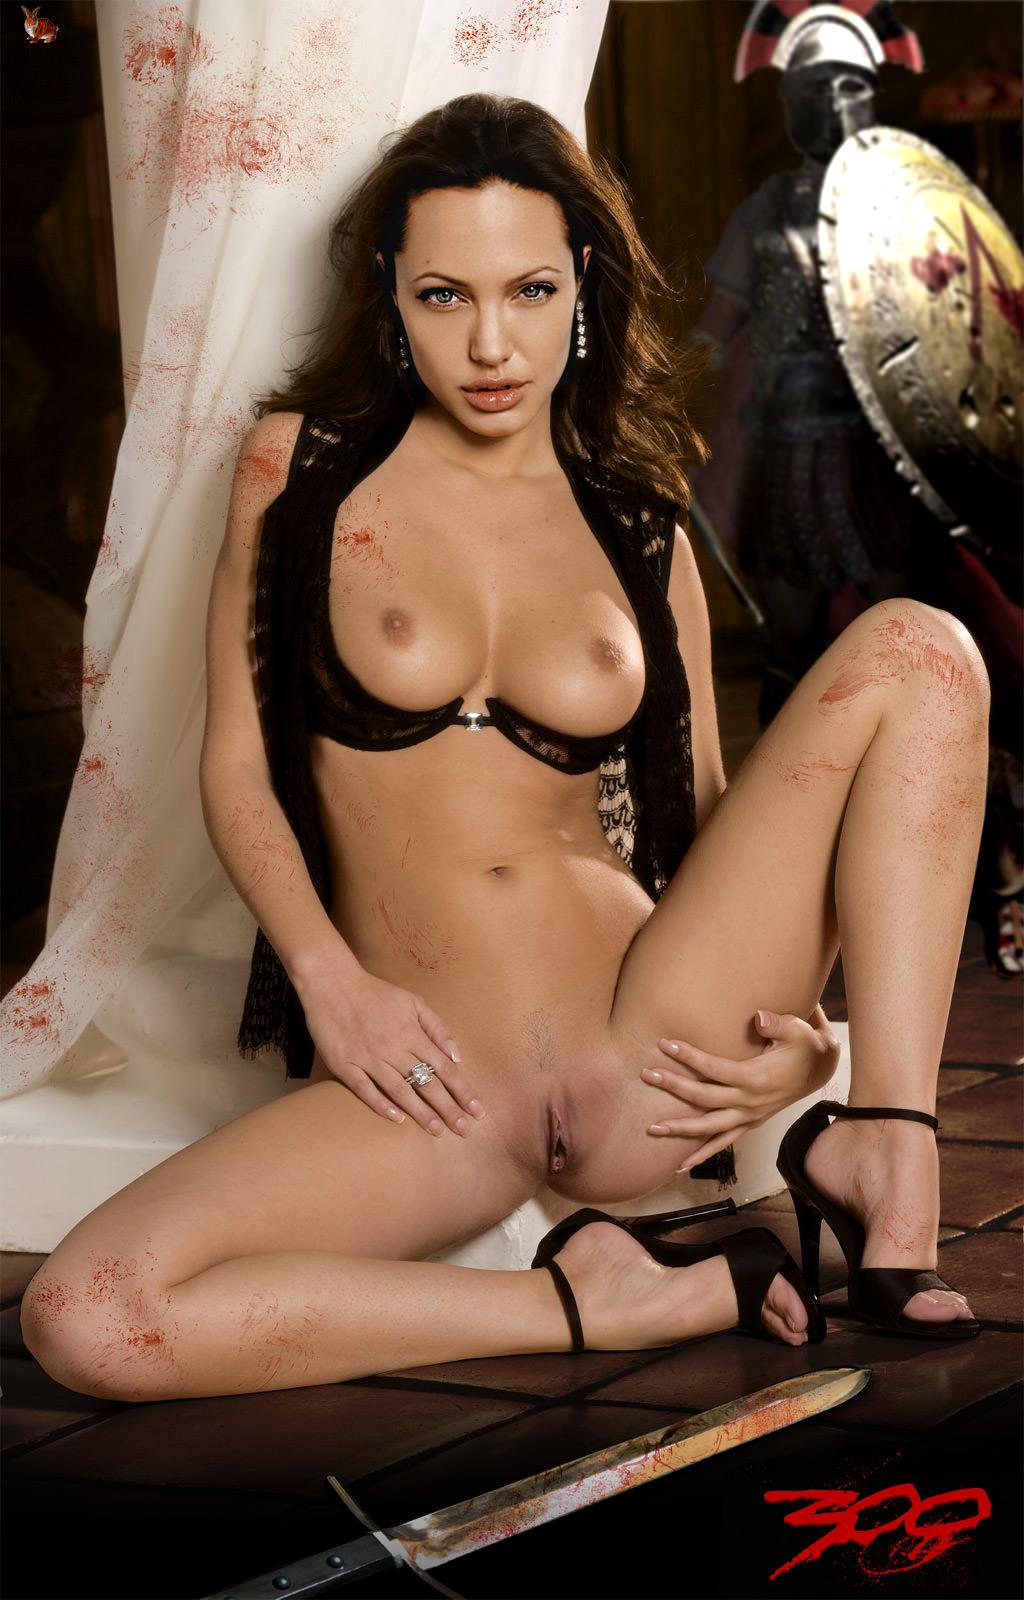 порнозвезда анджелина джоли взяла головку